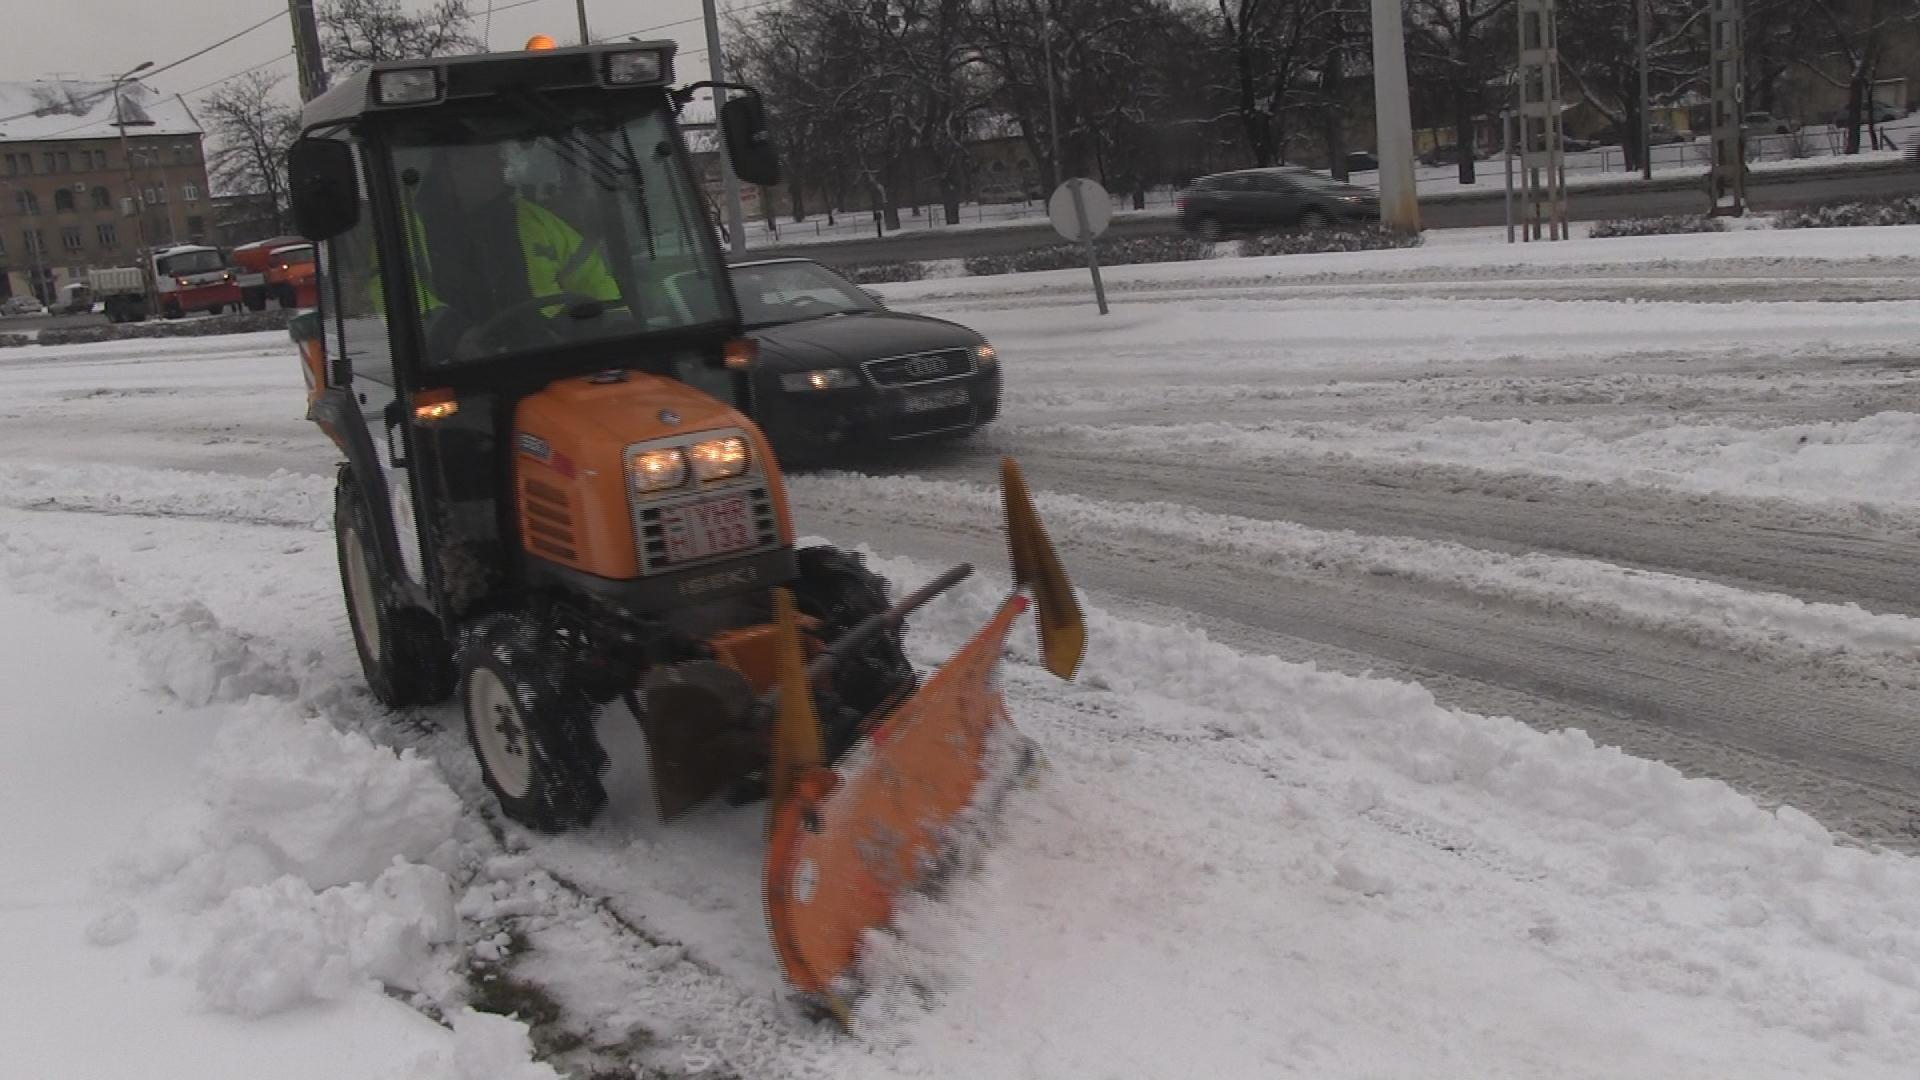 Betemette a hó Budapestet